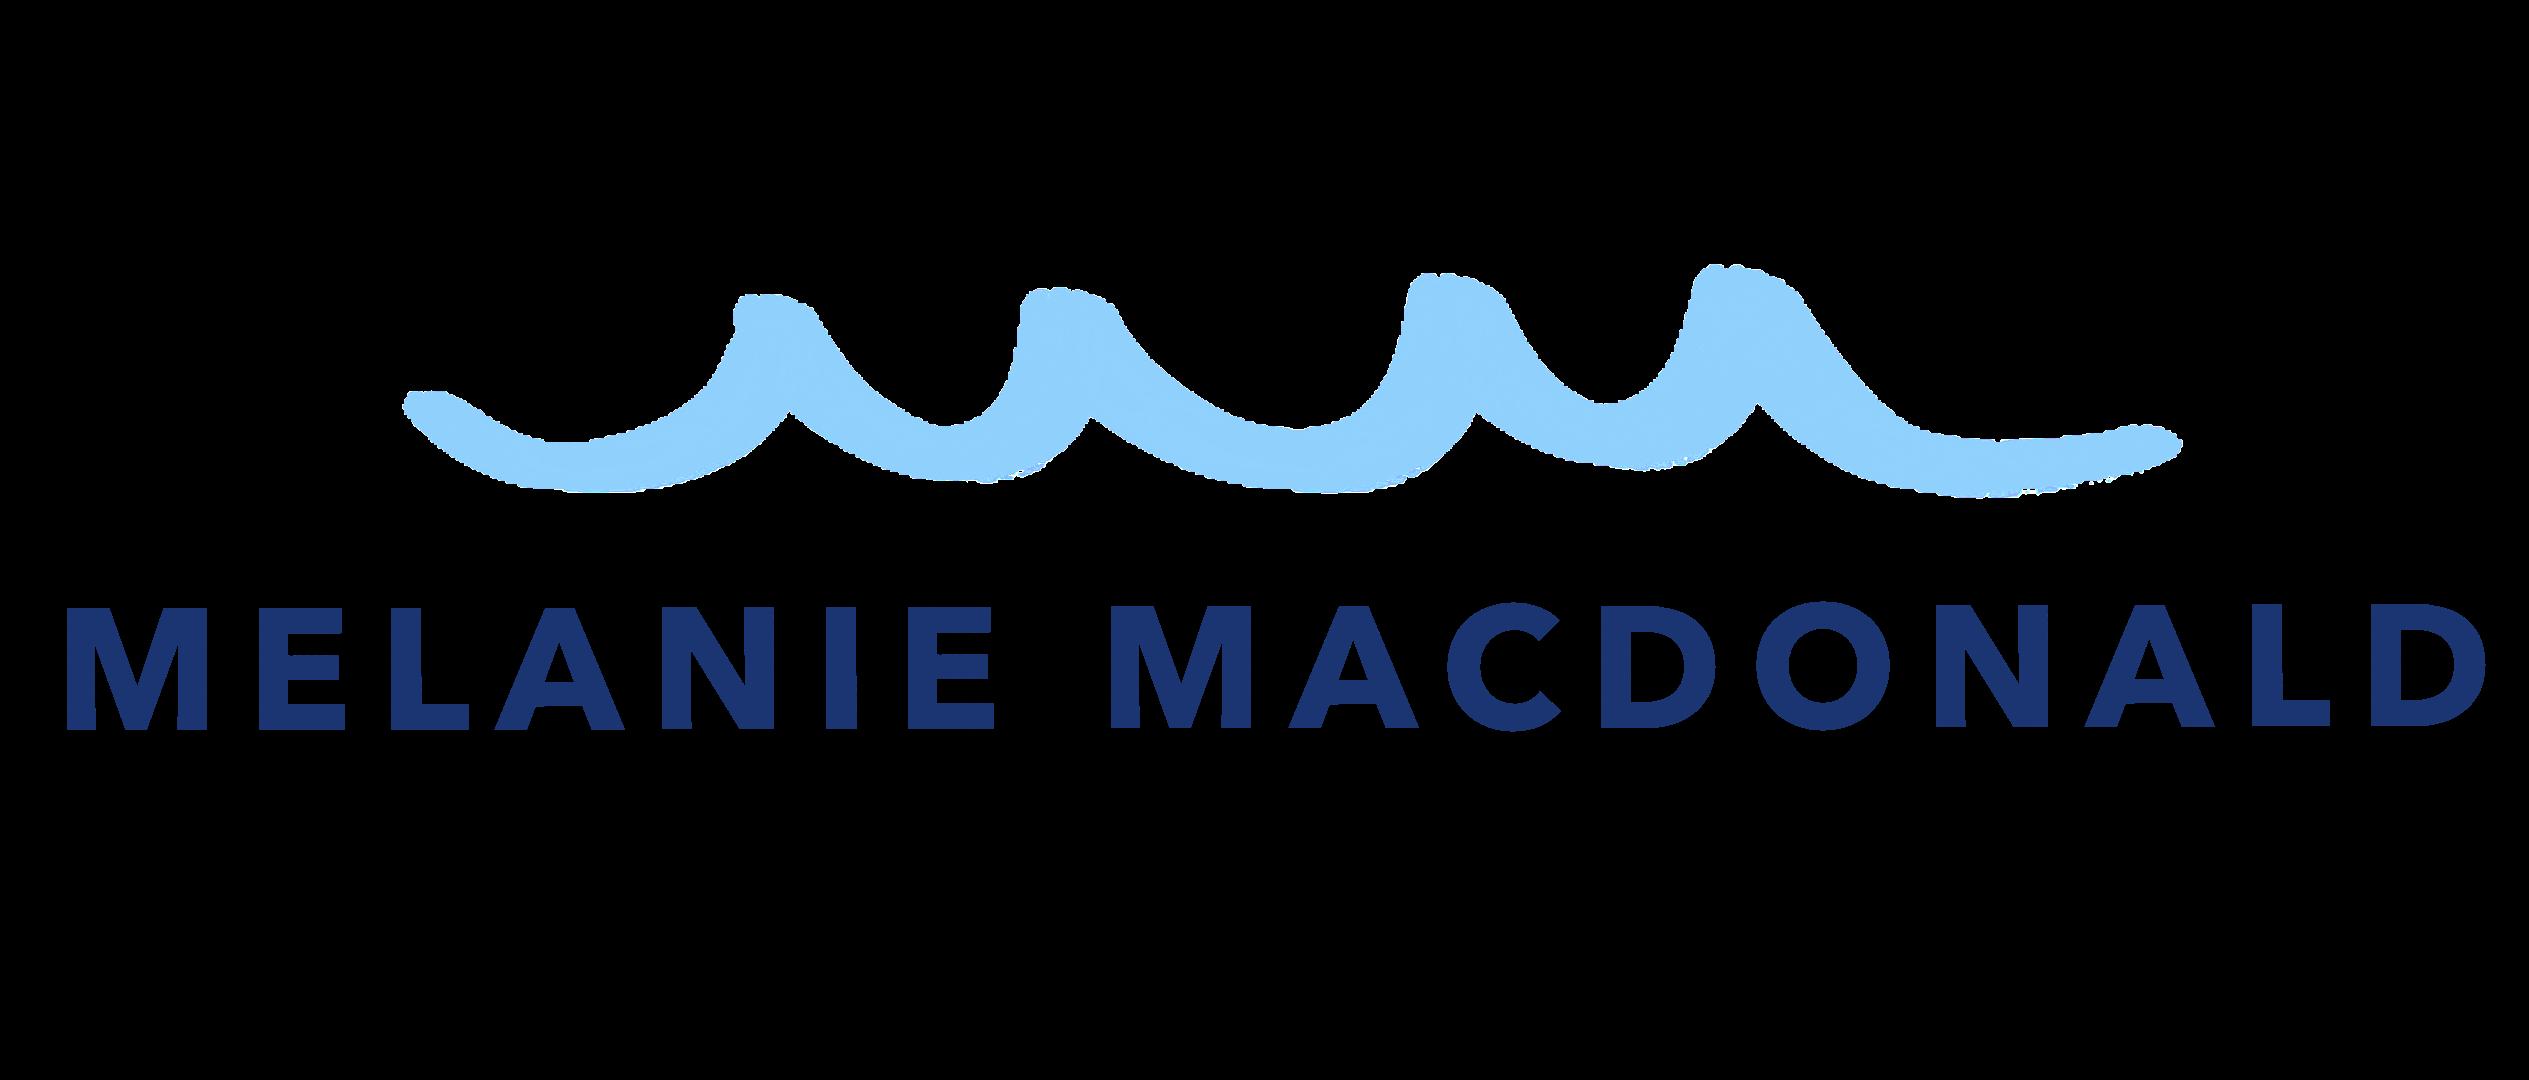 Melanie MacDonald